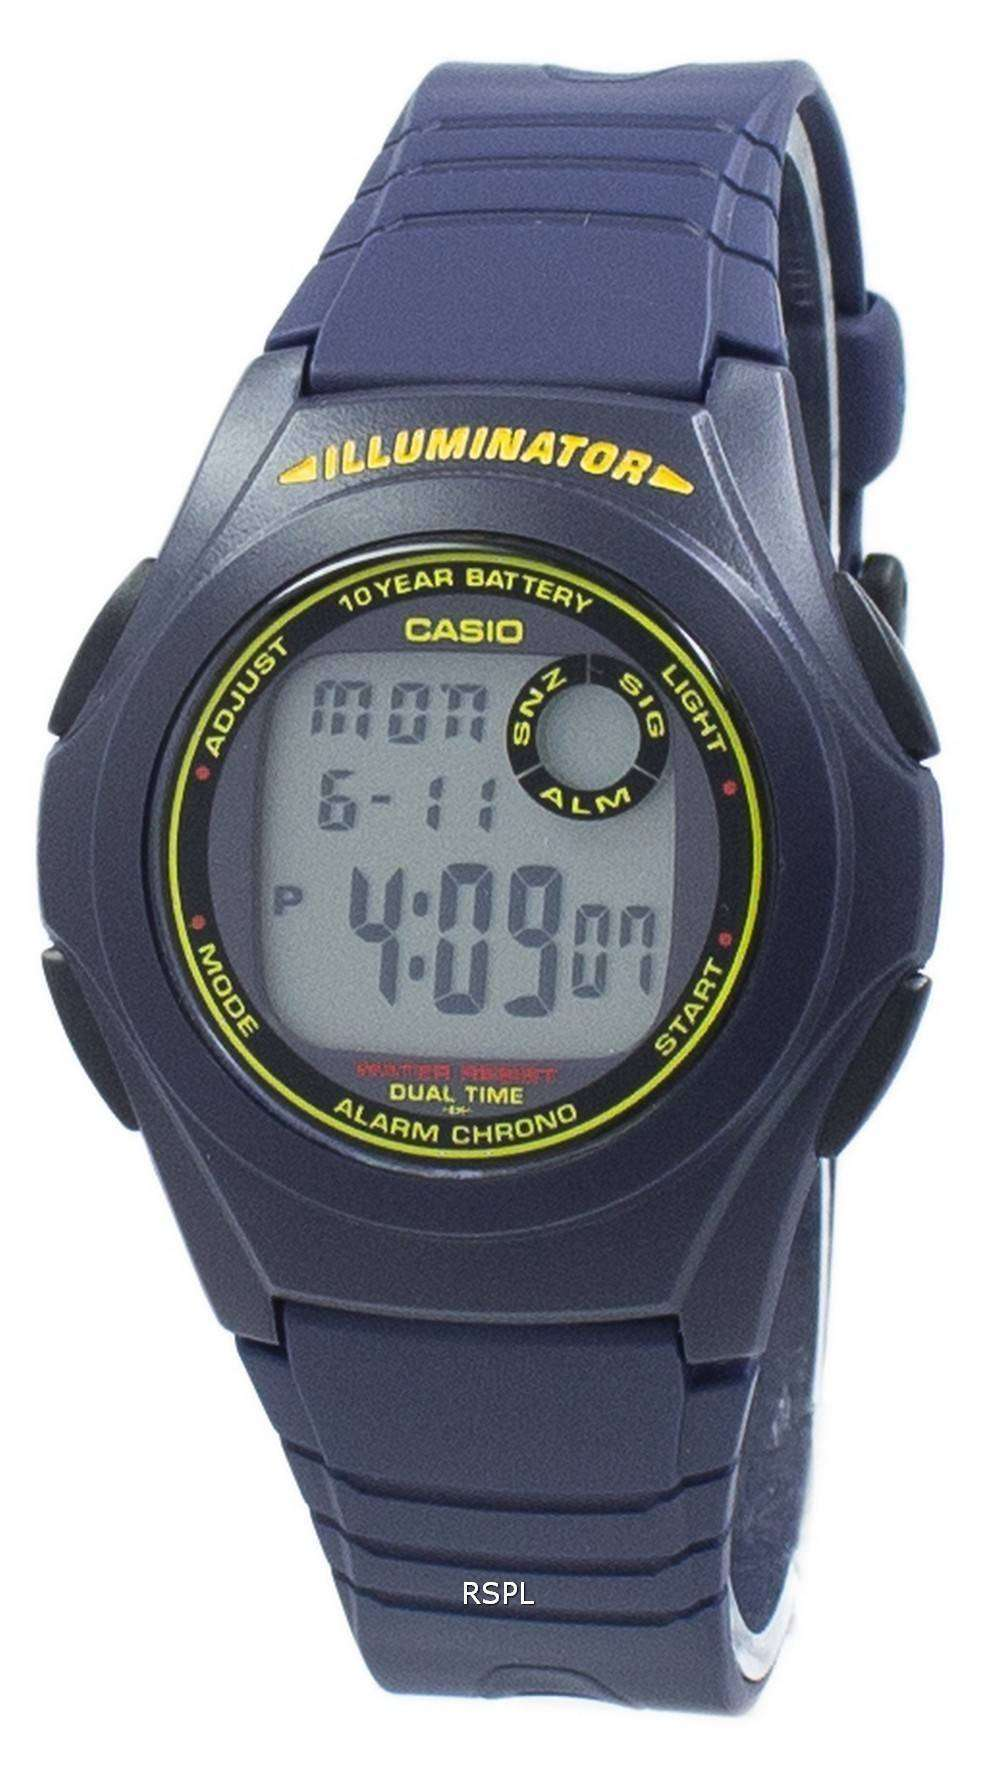 f046721137f1 Reloj Casio iluminador Dual Time crono Digital F200W F-200W-2B-2B de ...